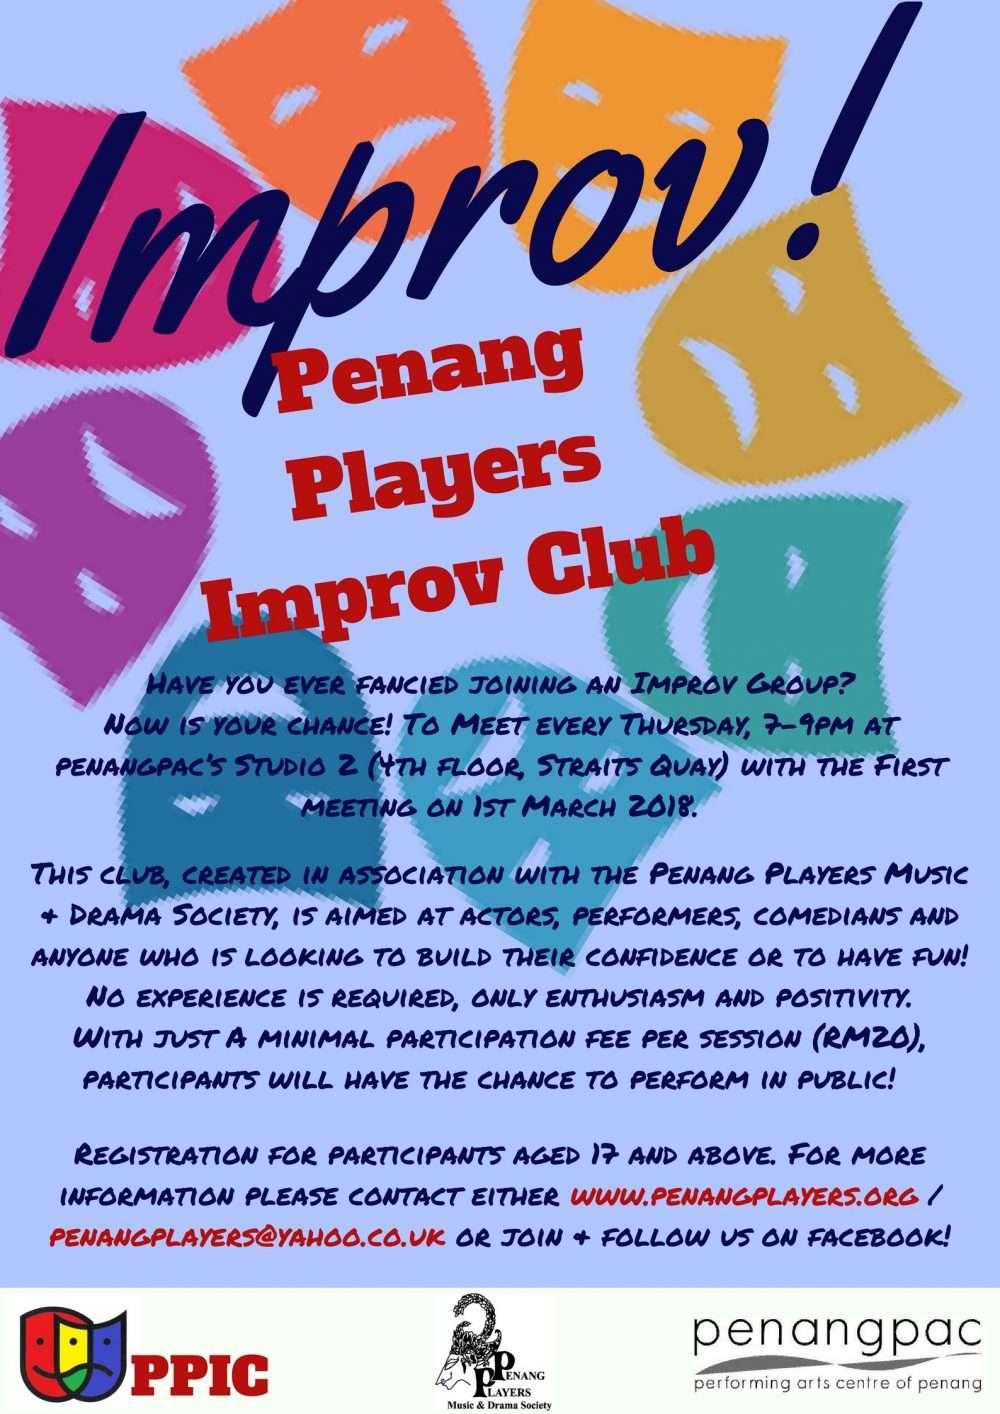 Penang Players Improc Club Flyer